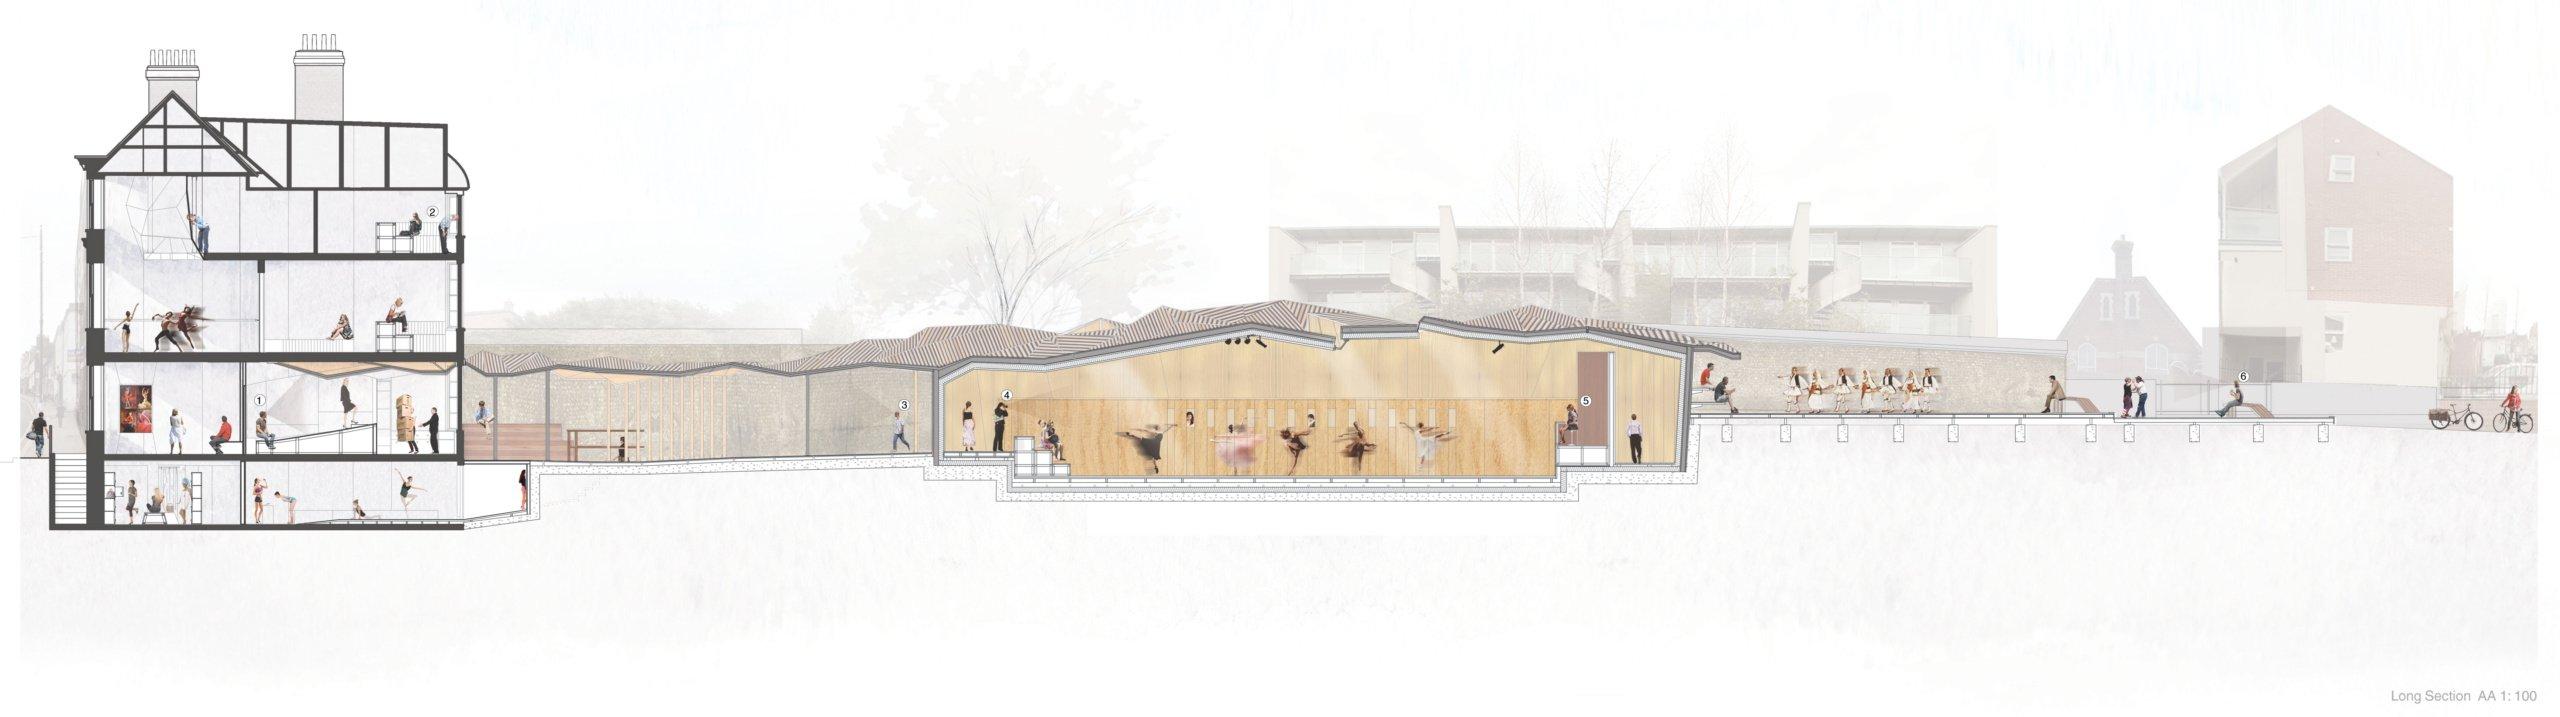 ana_sidorova technology-Dance Theatre Lewes town (33)